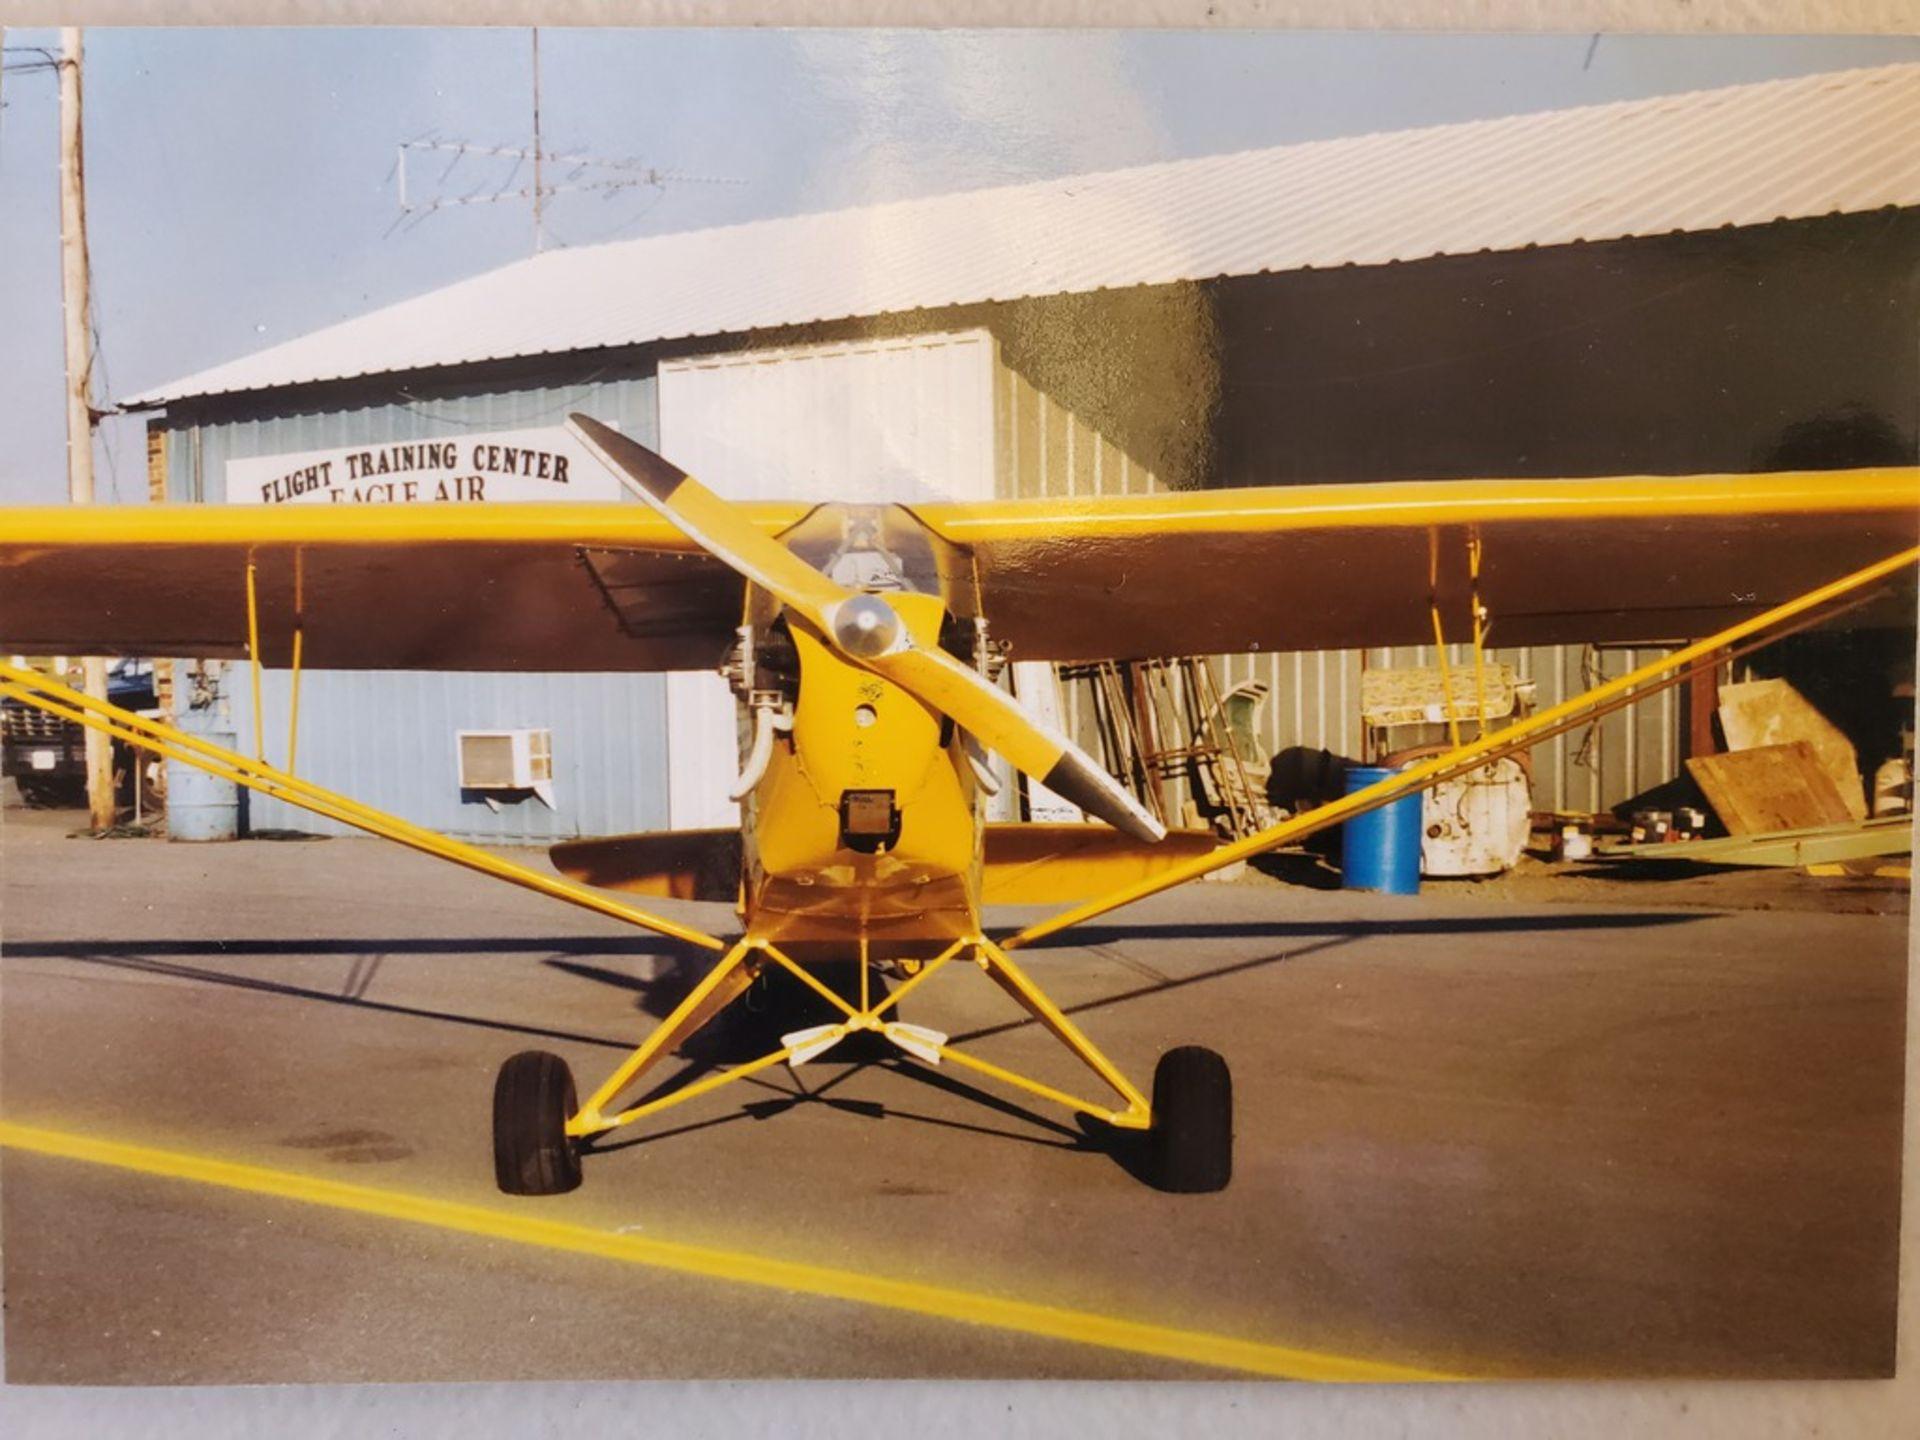 1936 TAYLOR/PIPER J2 CUB N16769 S/N 771 - Image 2 of 4